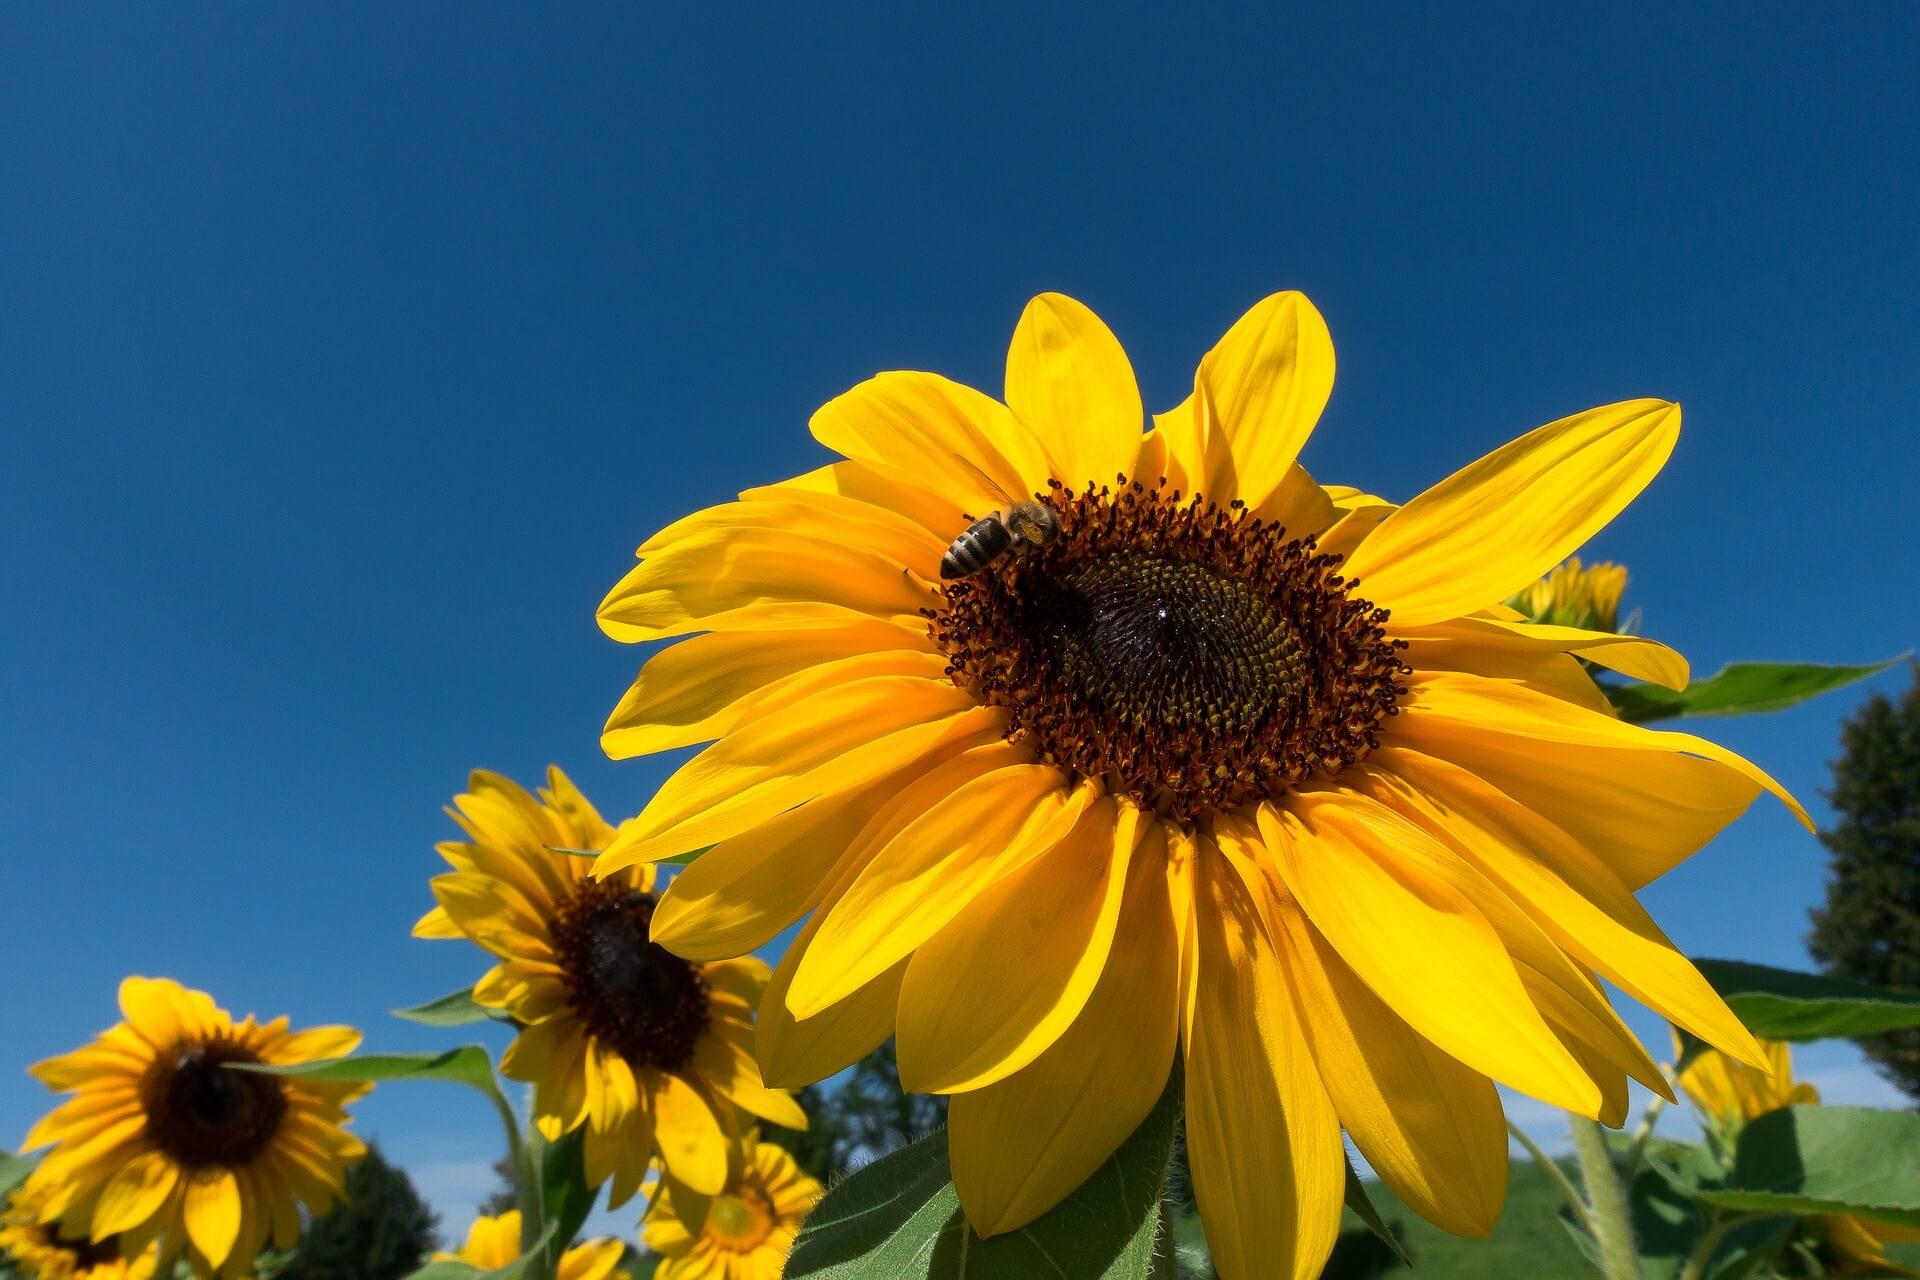 Car Hdr Wallpaper Moving Towards The Light The Secret Of The Sunflower